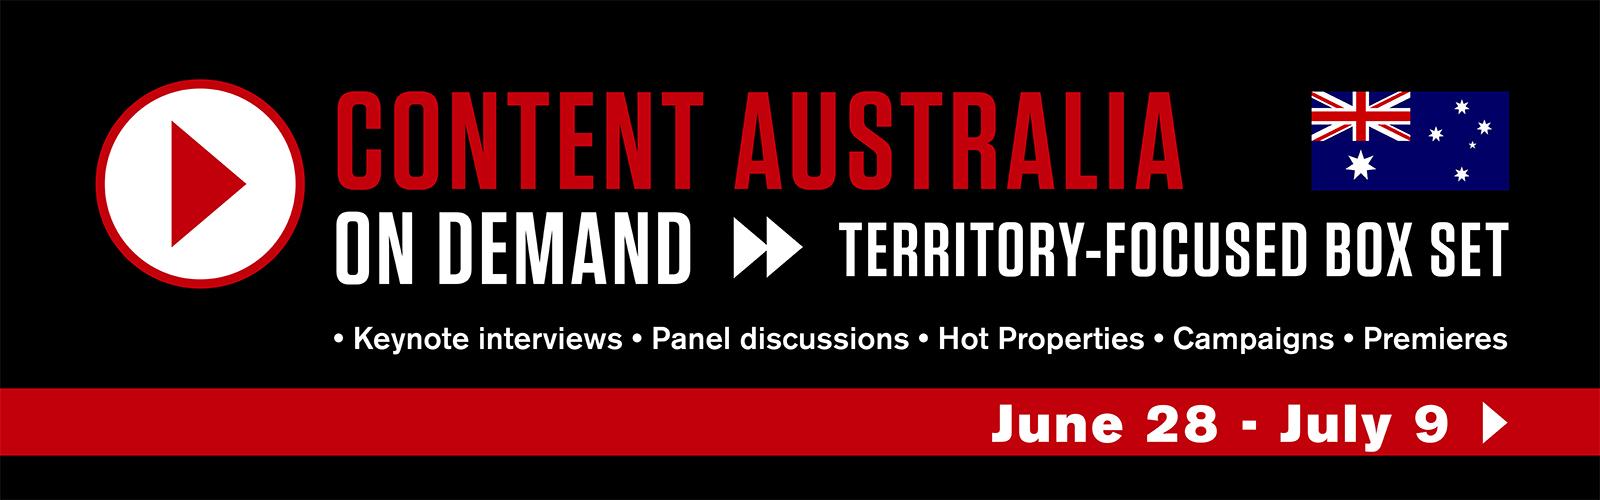 Content Australia On Demand